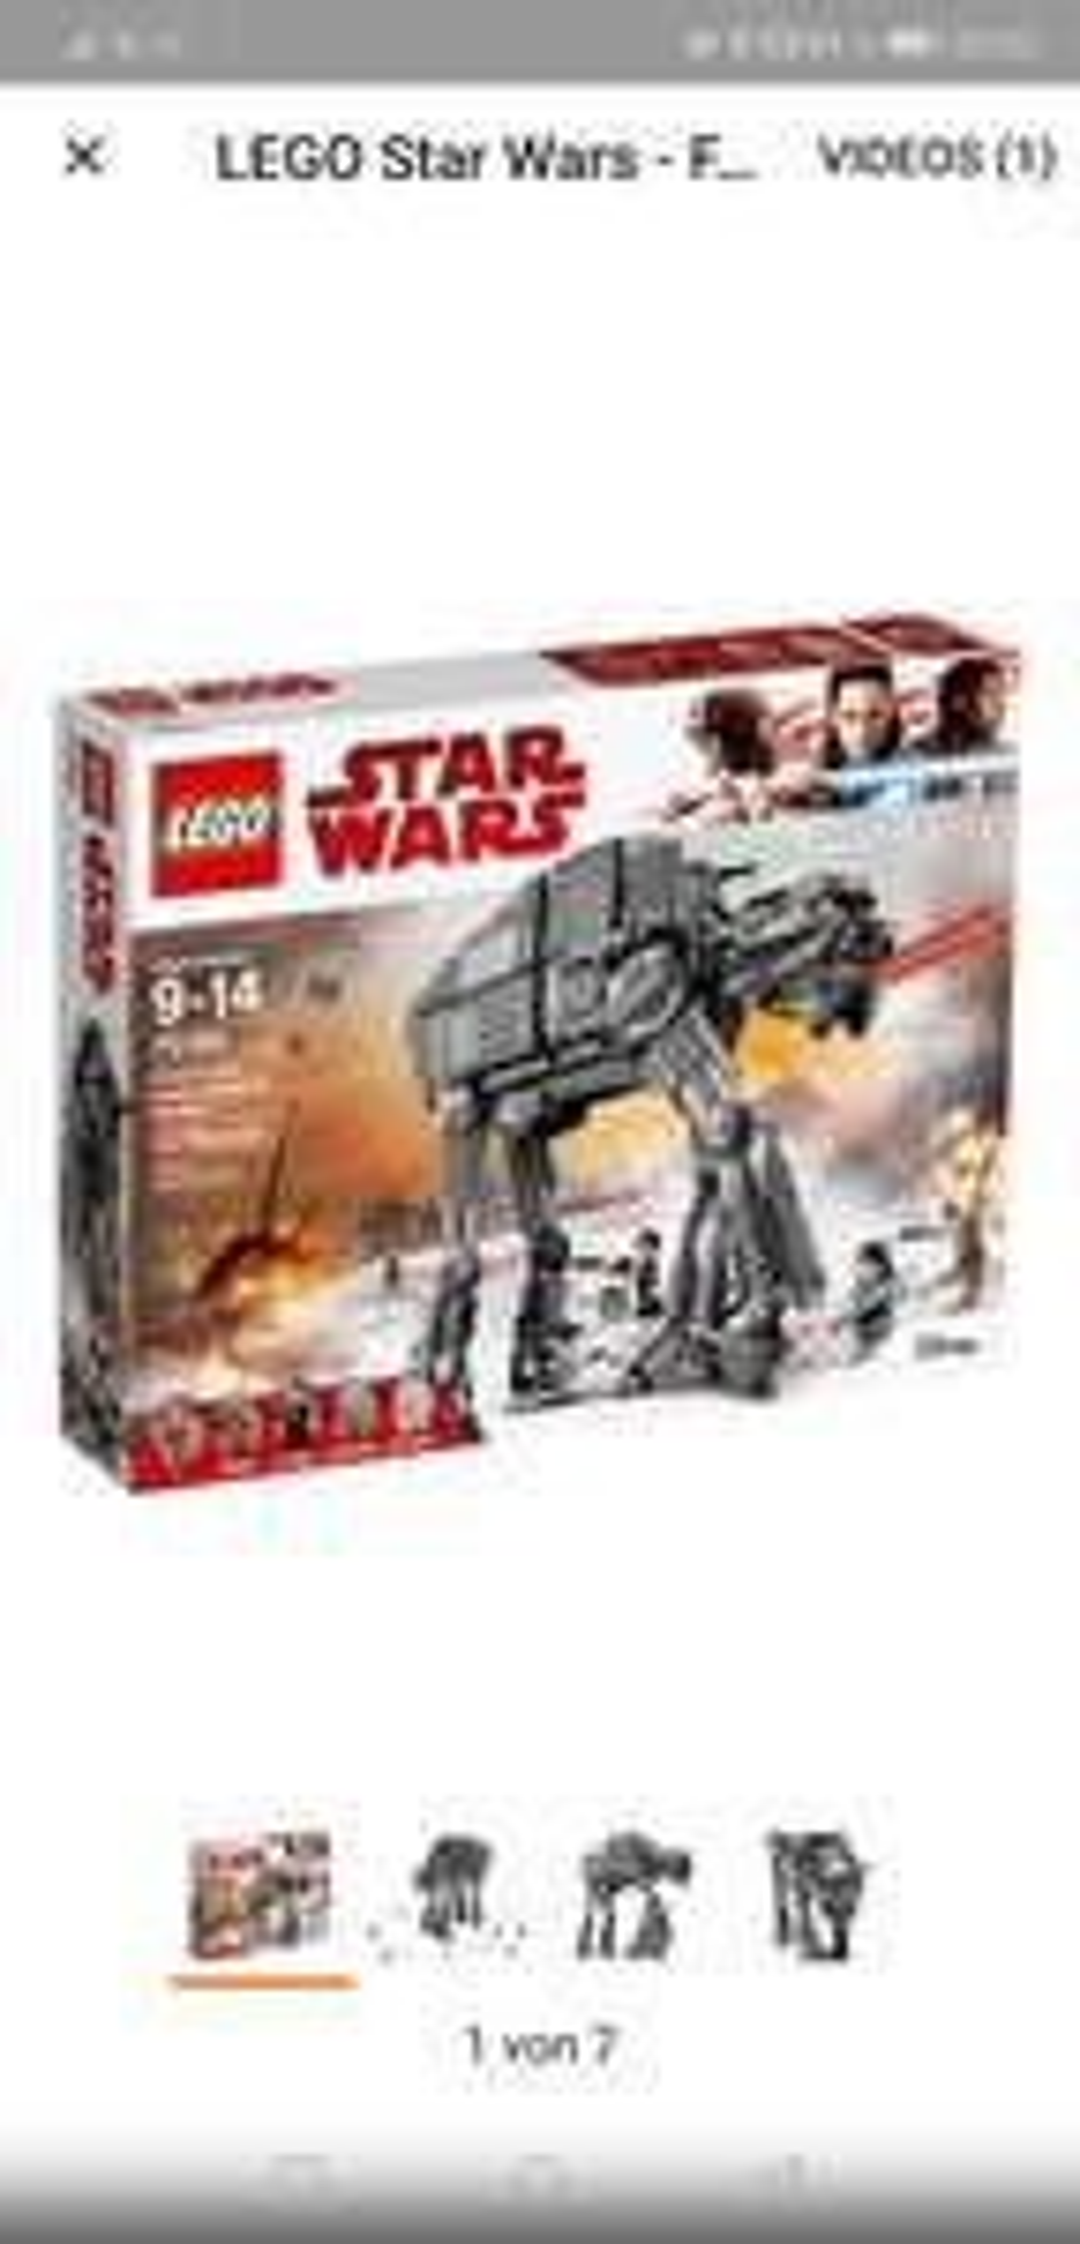 [Lokal Real 59555]LEGO Star Wars - First Order Heavy Assault Walker (75189) & Playmobil Action - Polar Ranger Hauptquartier (9055) für 25€